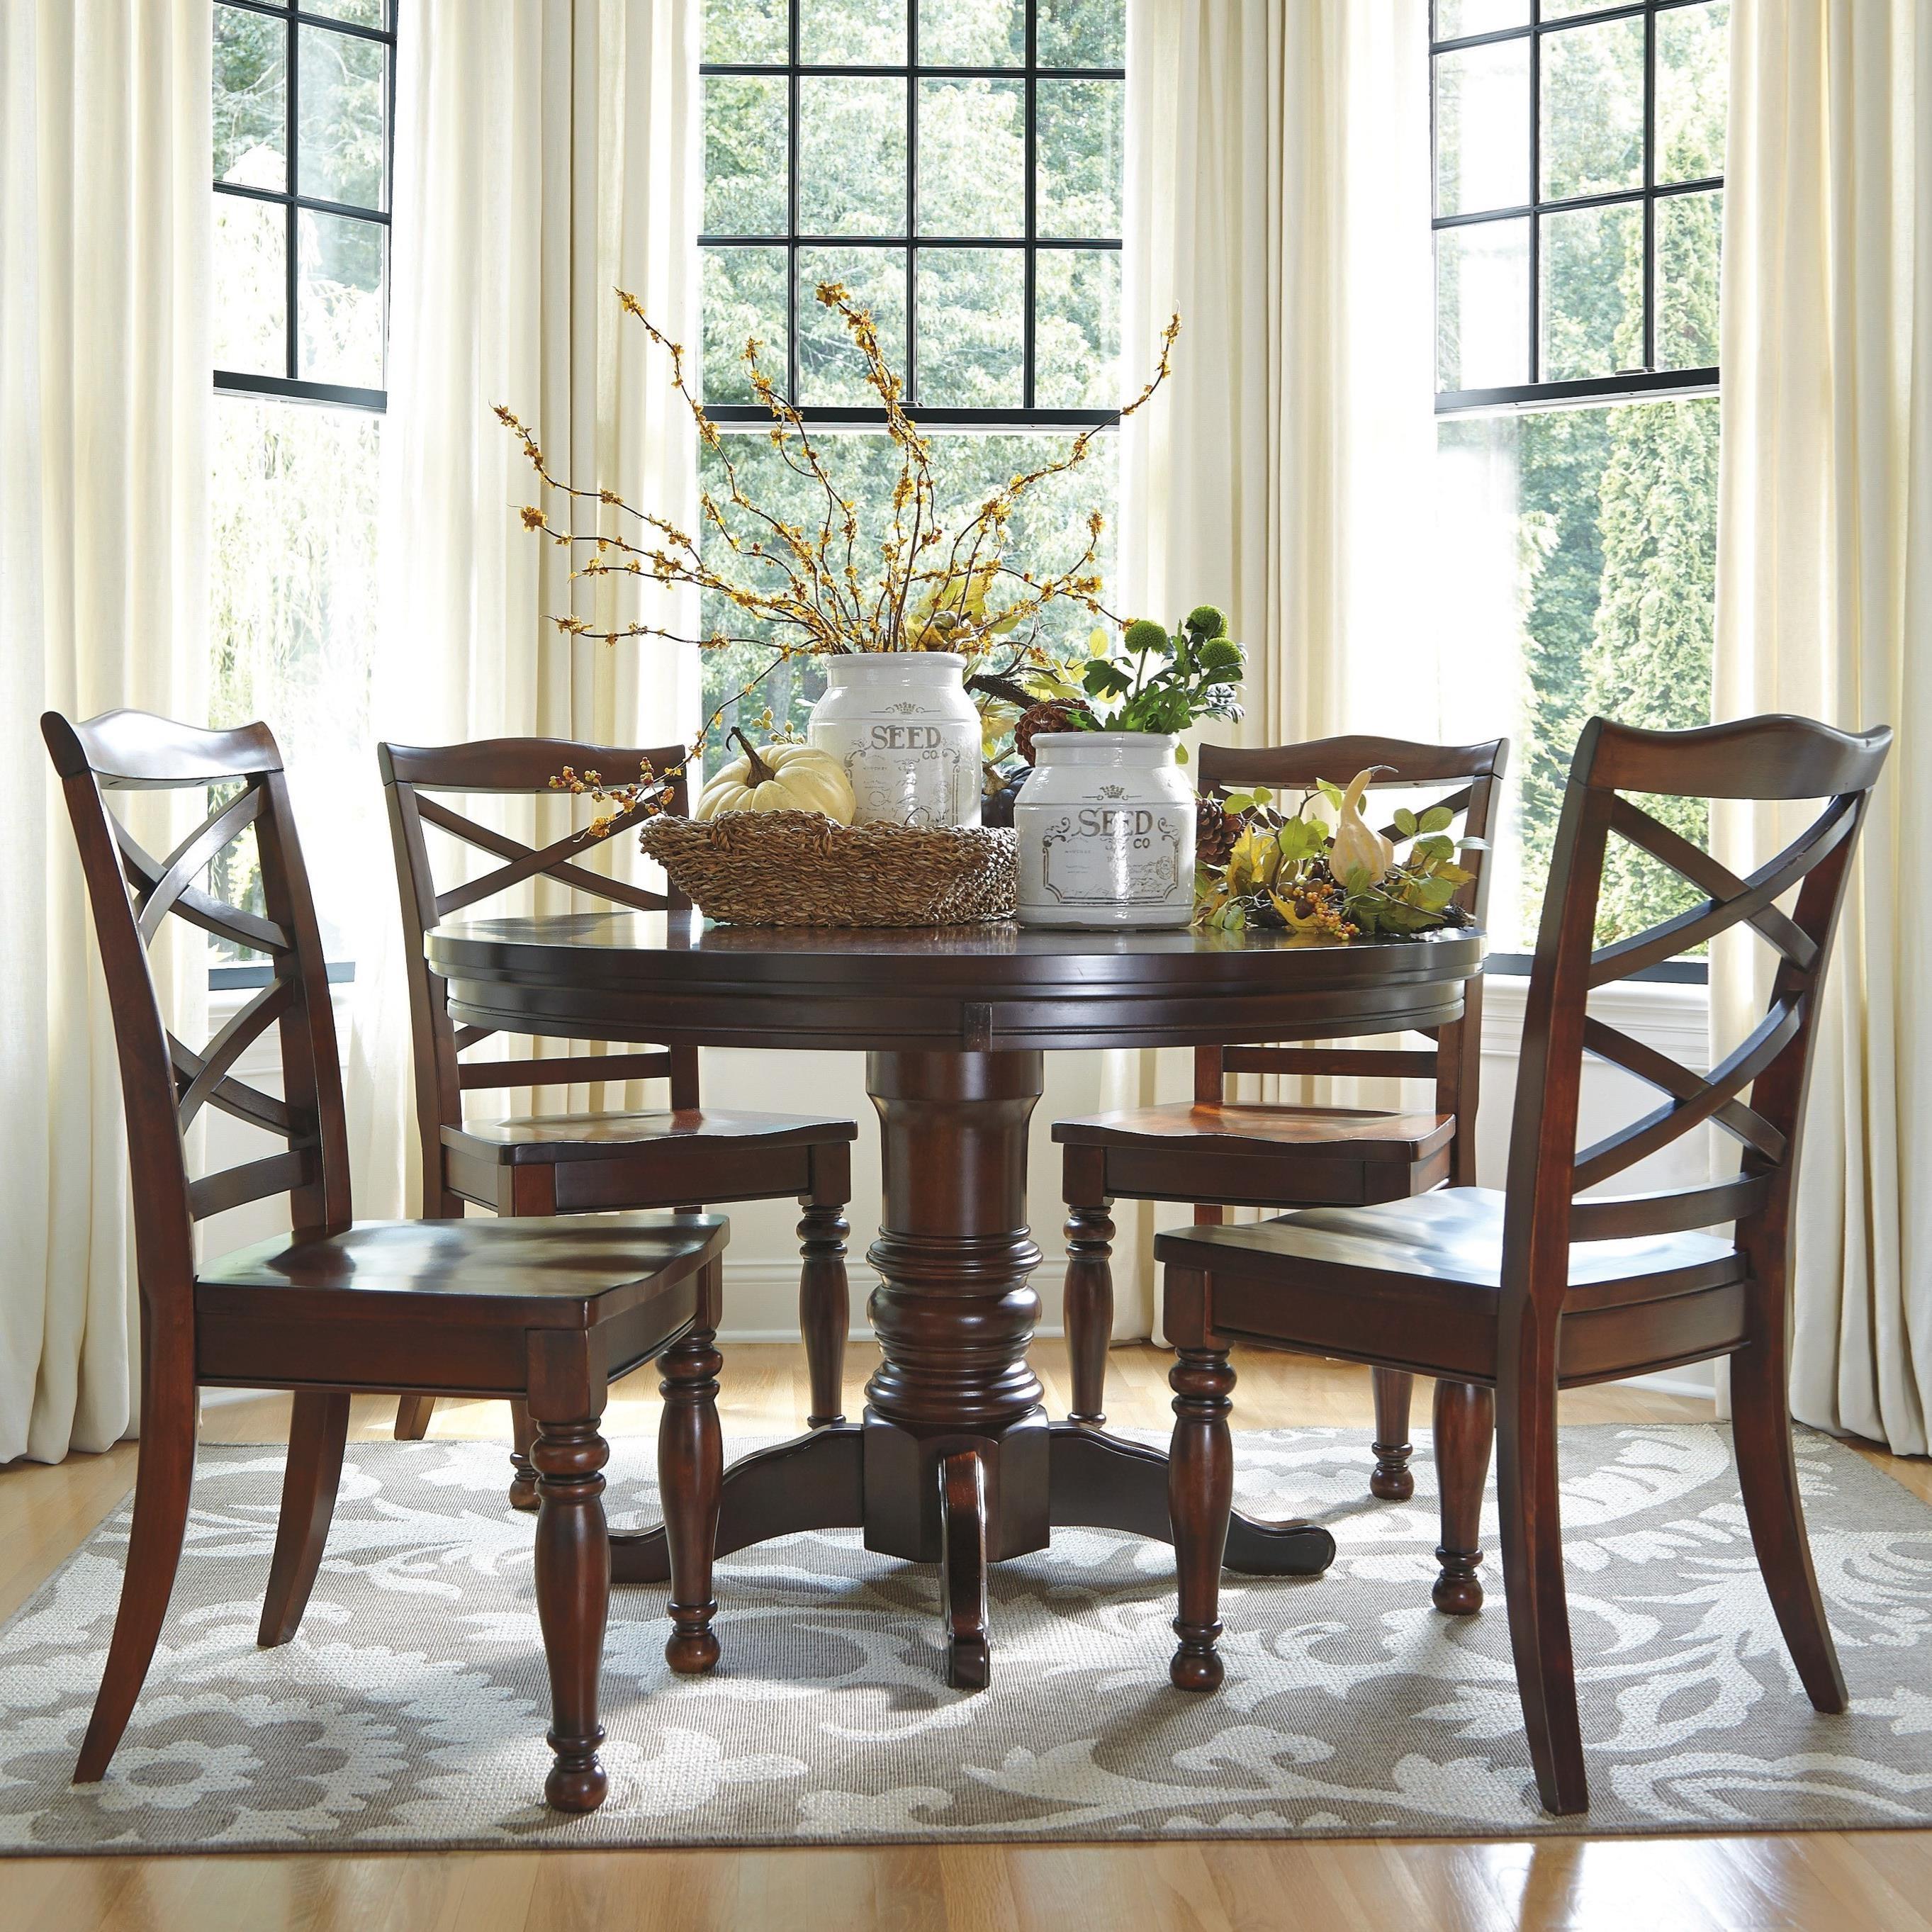 Merveilleux Ashley Furniture Porter (Beaverton Store Only) 5 Piece Round Dining Table  Set